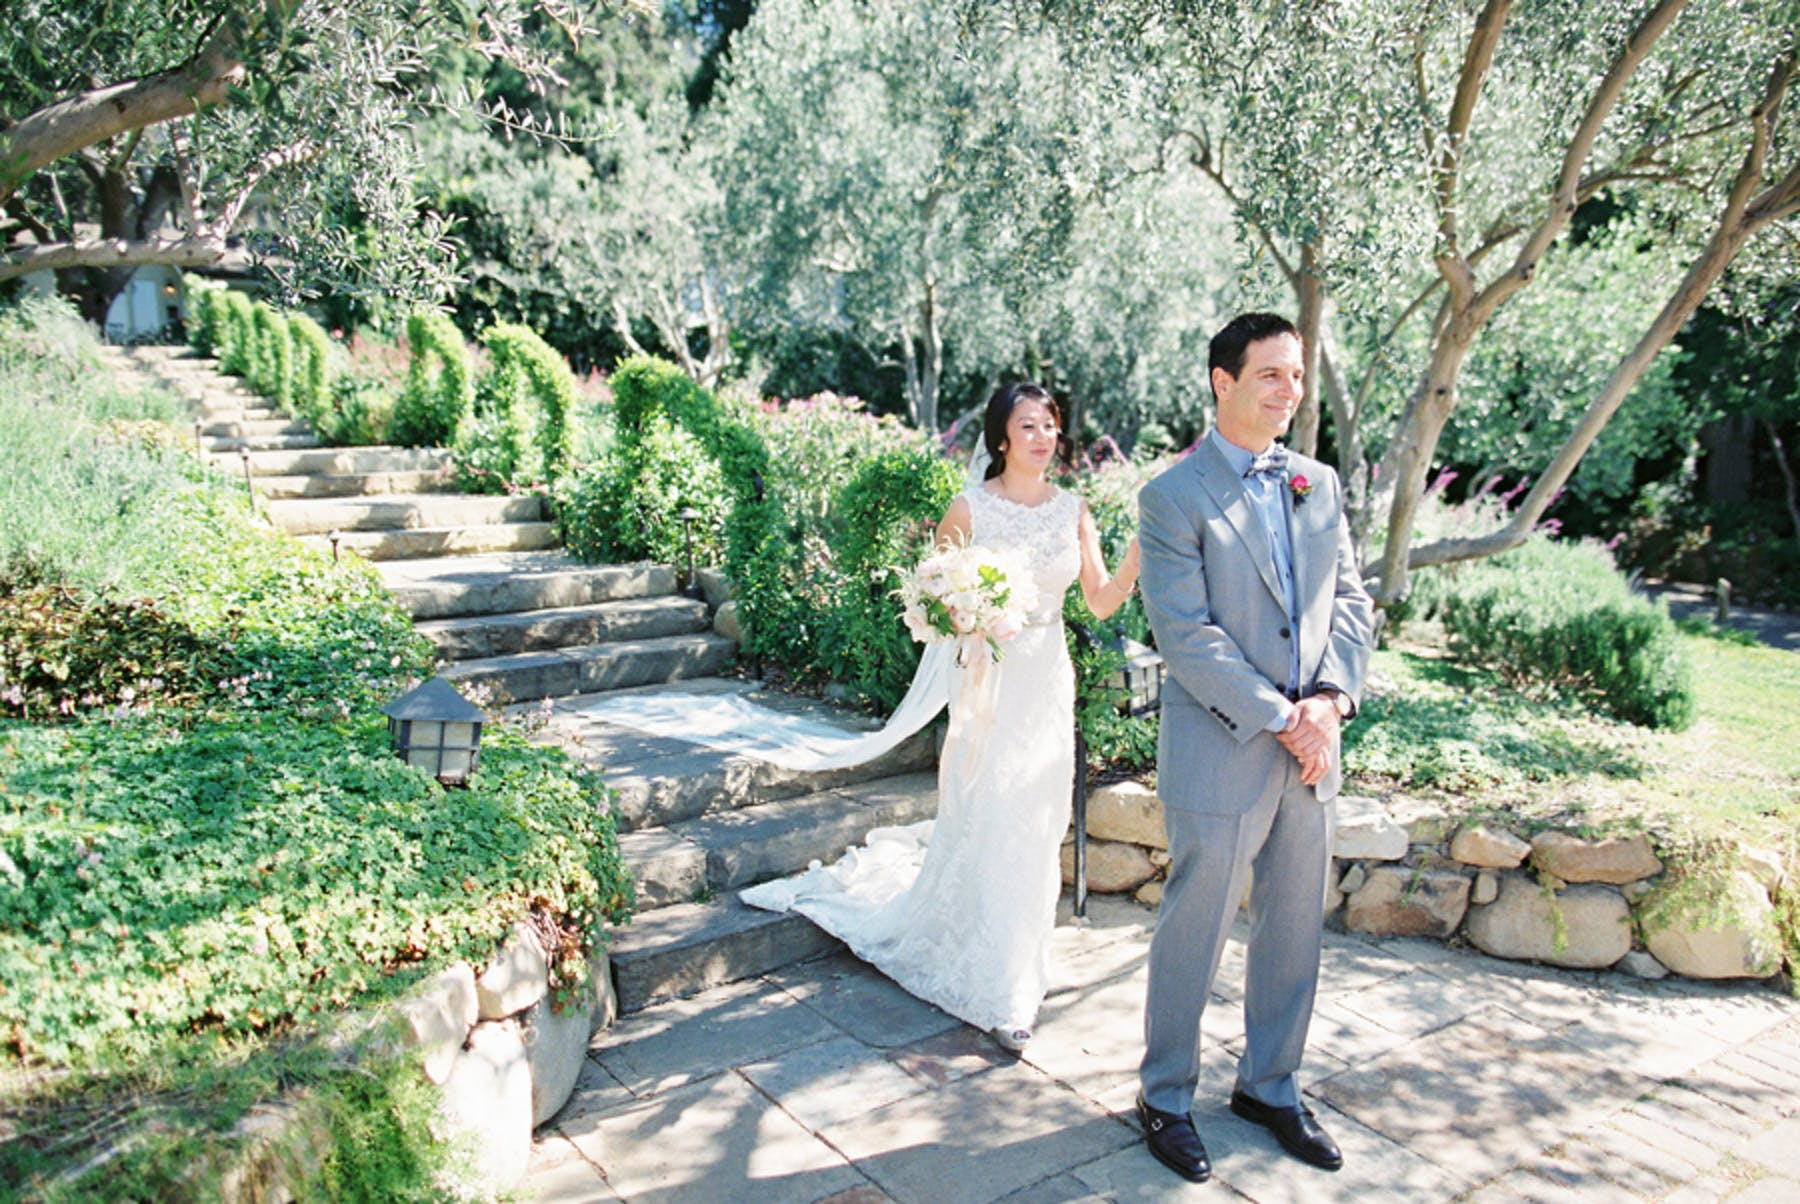 www.santabarbarawedding.com | Michael + Anna Costa Photography | San Ysidro Ranch | Twine Events | Bride Surprises Groom